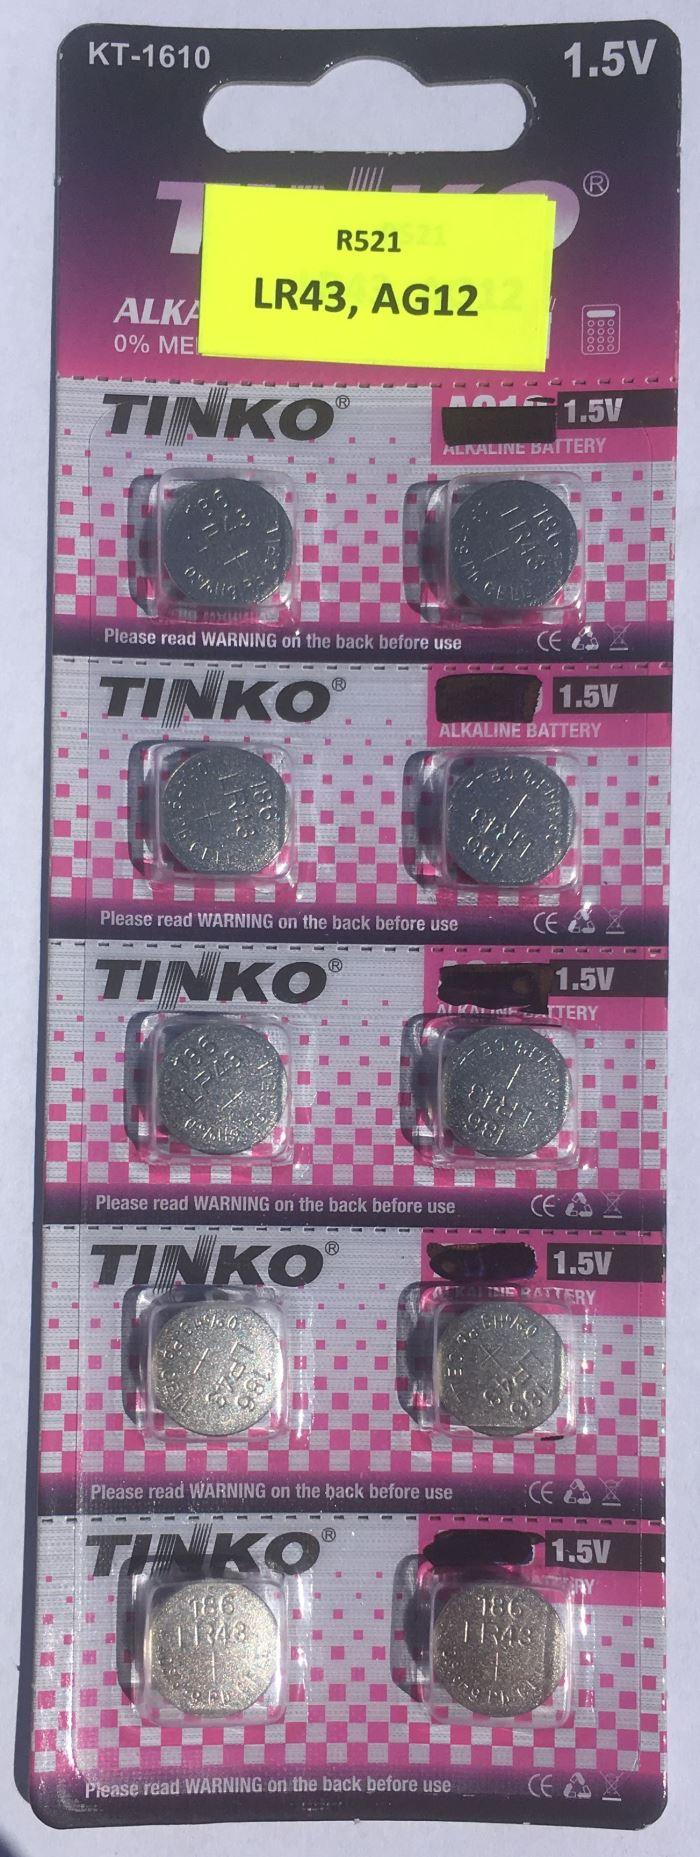 Baterie TINKO LR43 (AG12) alkalická, 10ks, opravený popis, po expiraci